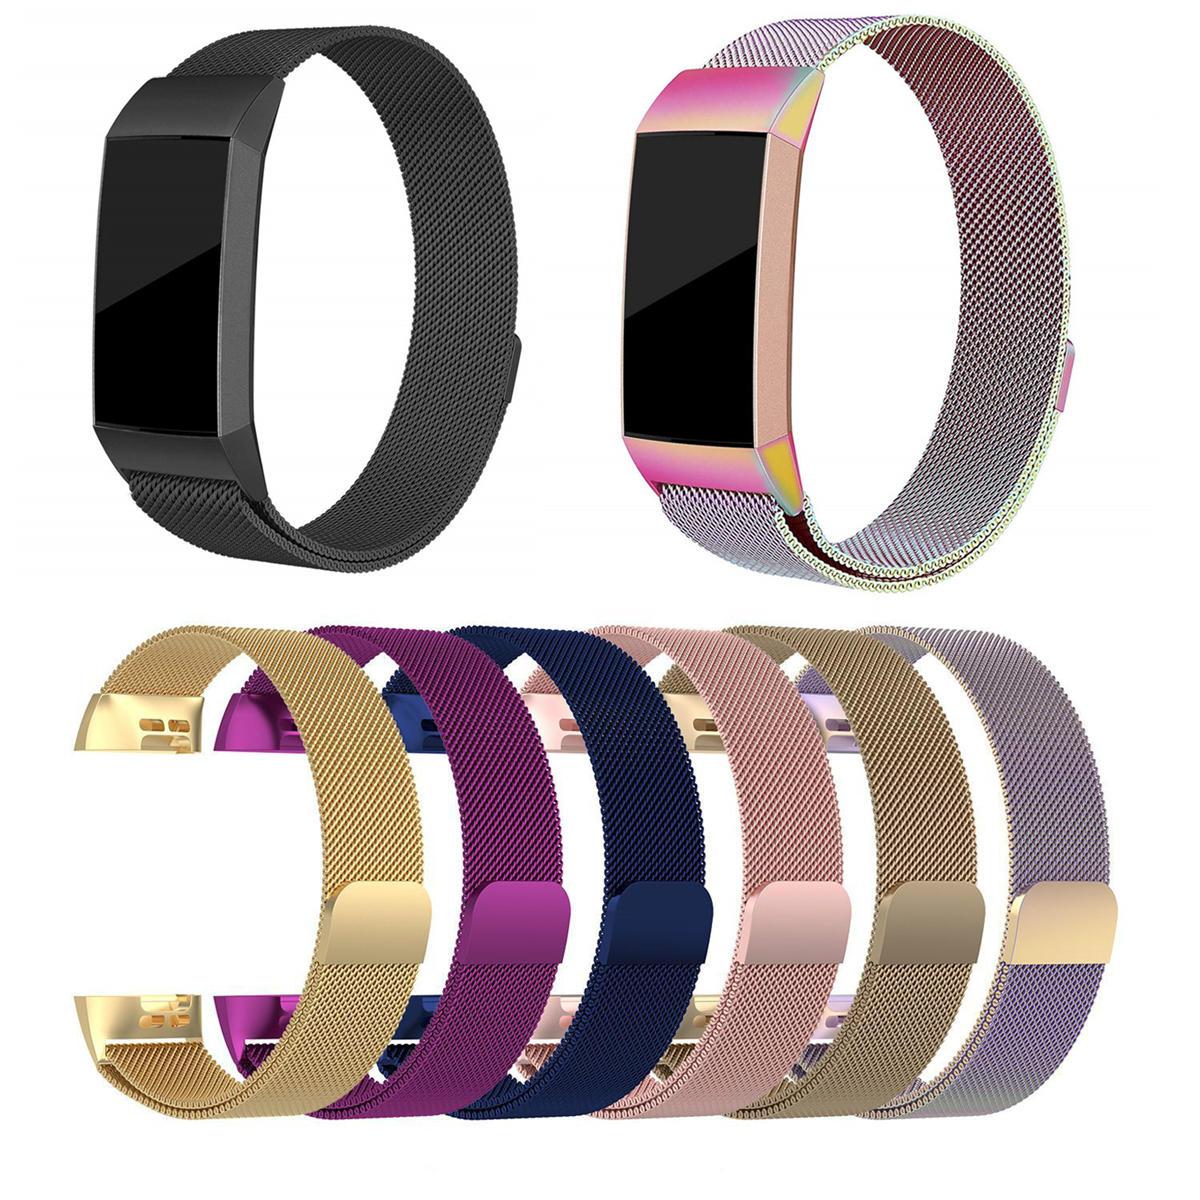 Bakeey Металлические часы из нержавеющей стали Milanese Loop Стандарты Ремешок для Fitbit Charge 3